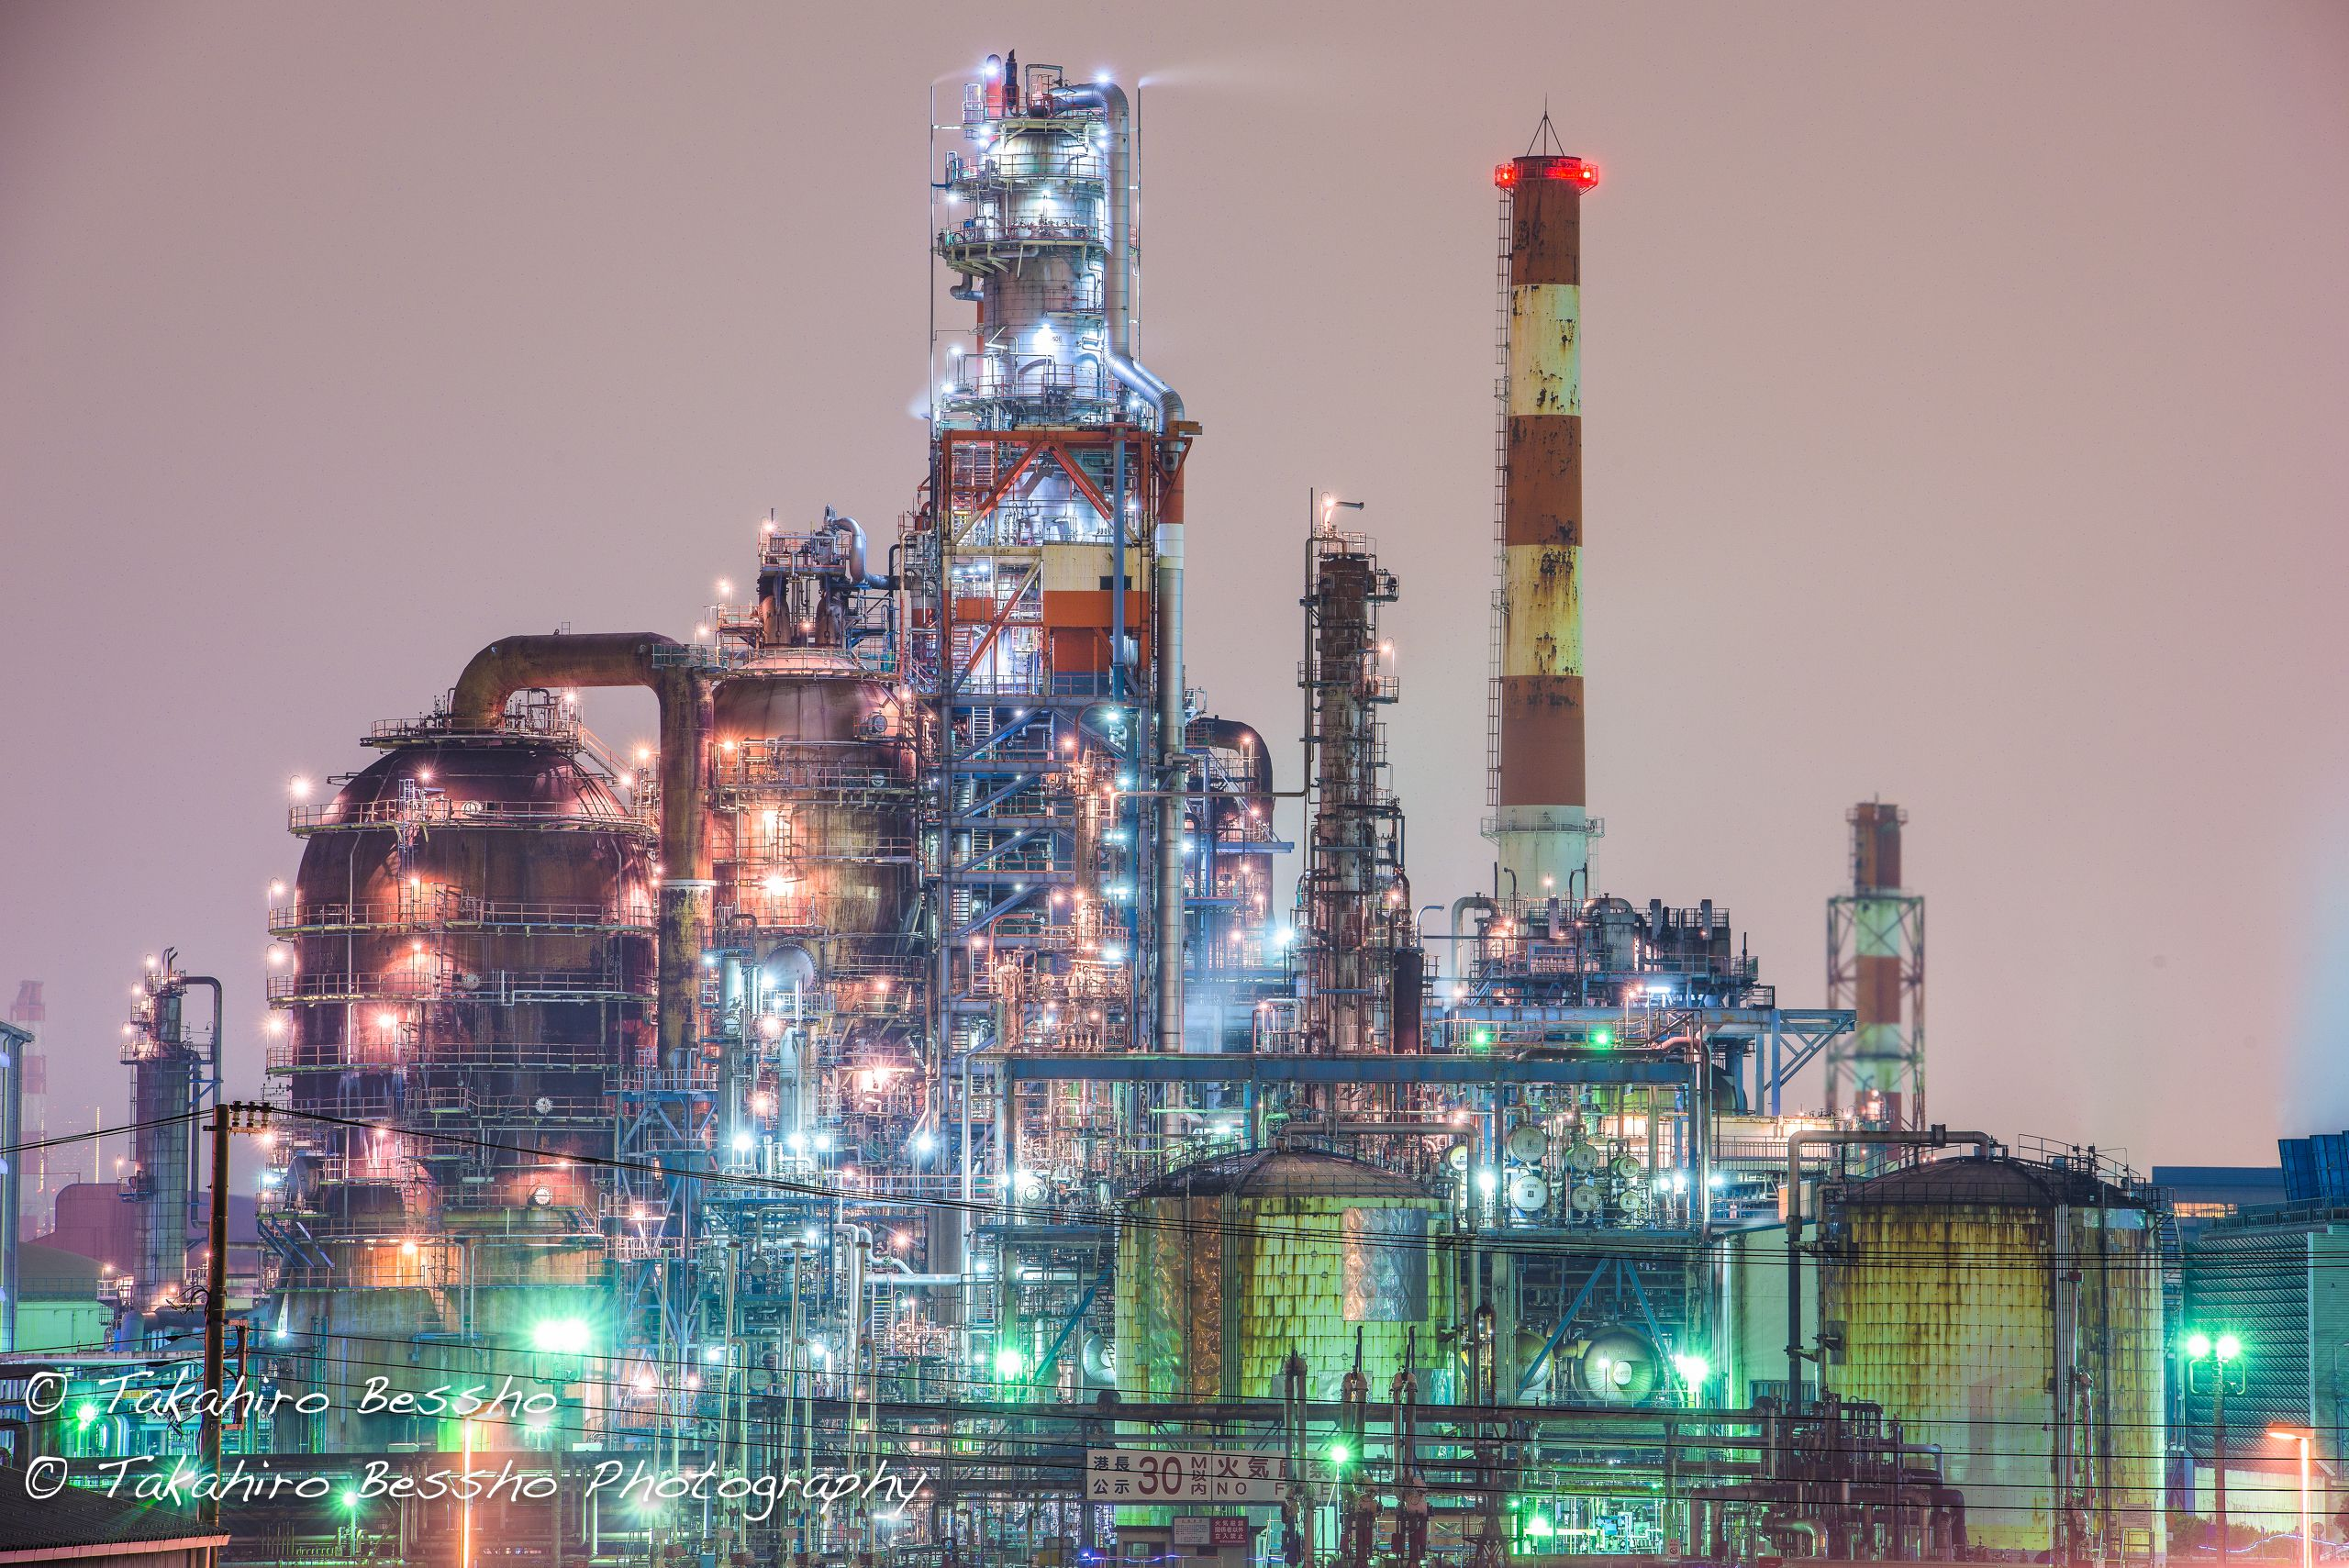 Twitterで話題 工場夜景 が ため息の出る美しさ 工場 夜景